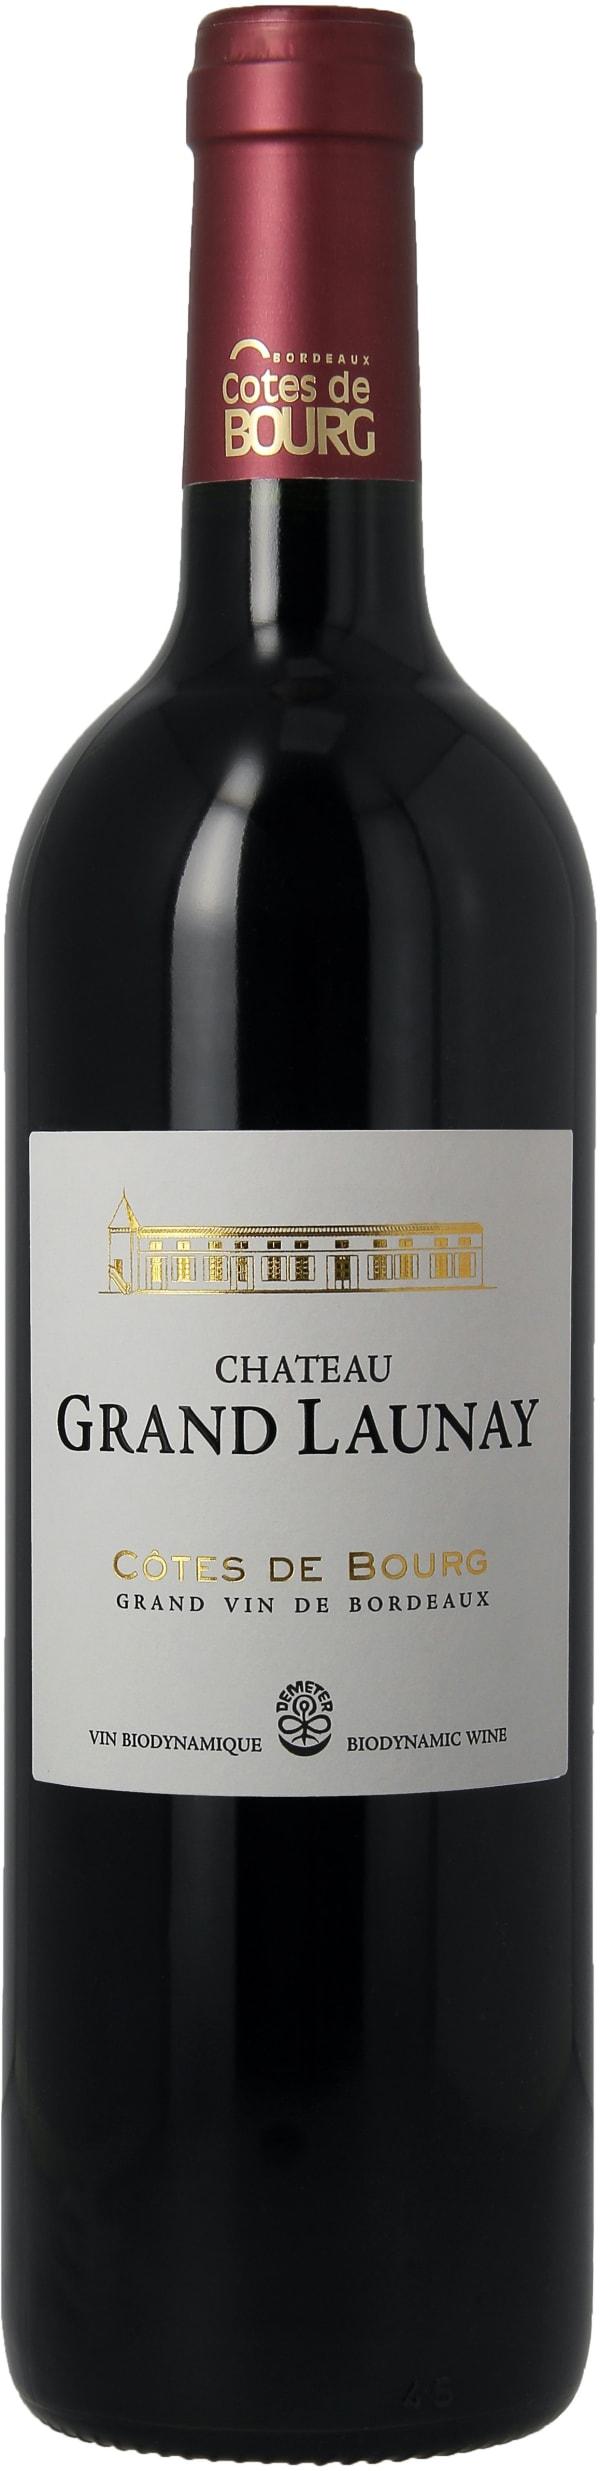 Château Grand Launay 2017